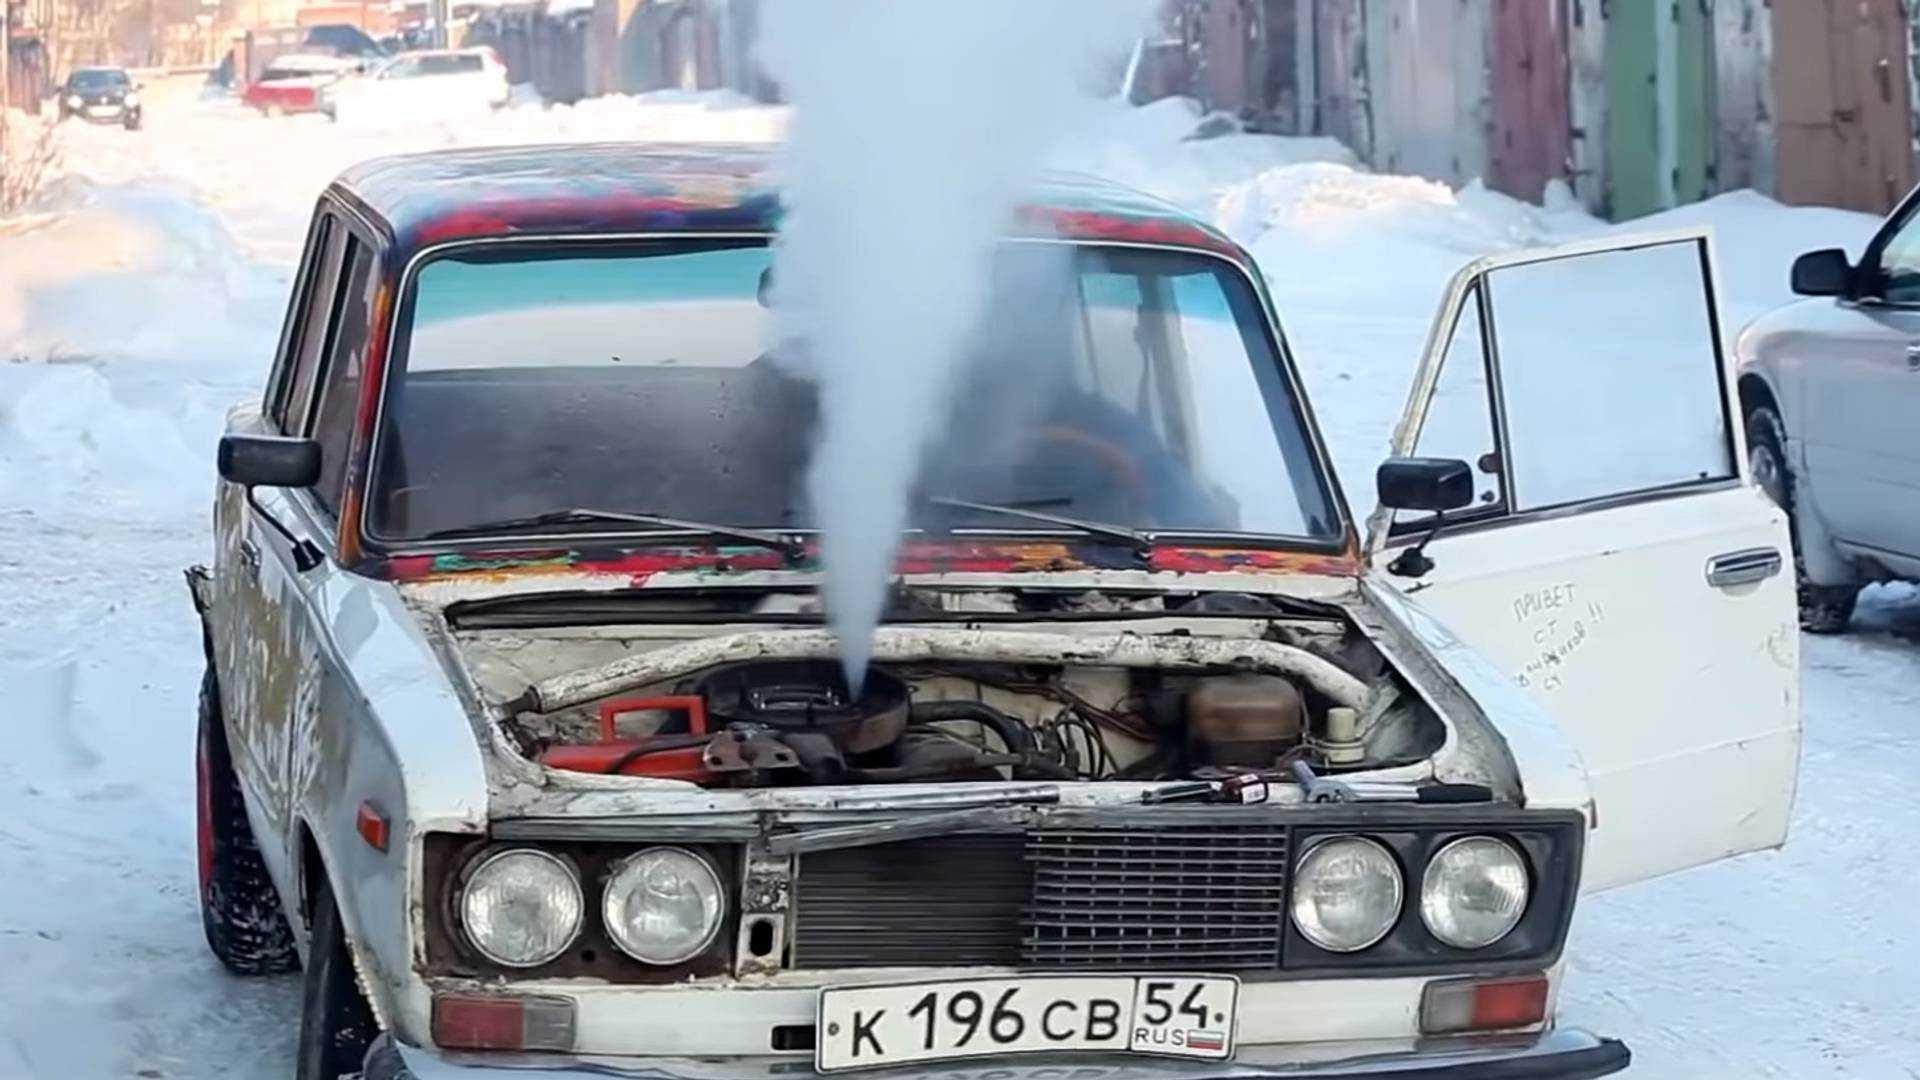 Poor Old Lada's Engine Feeds On Salt, Coke, And Vegetable Oil